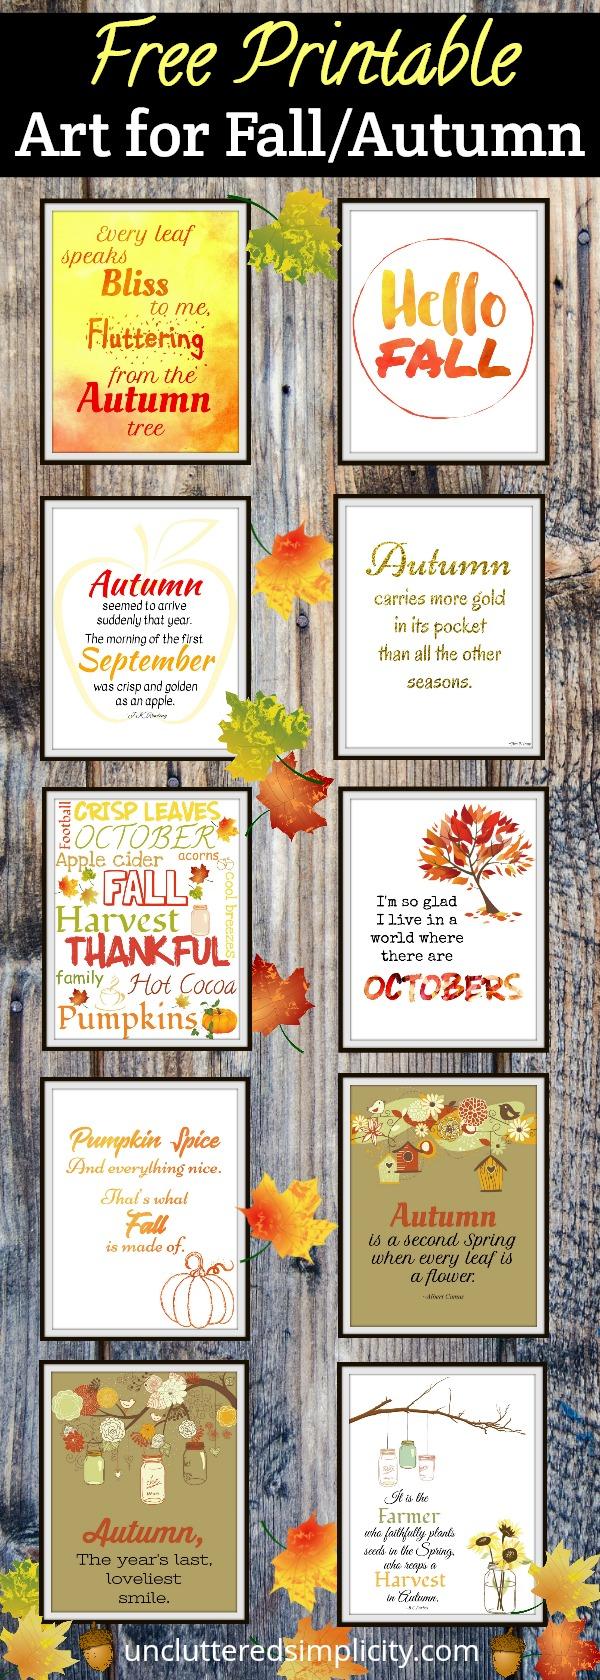 free fall printables | fall wall art | art for fall | autumn printables | free printables #fall #fallprintables